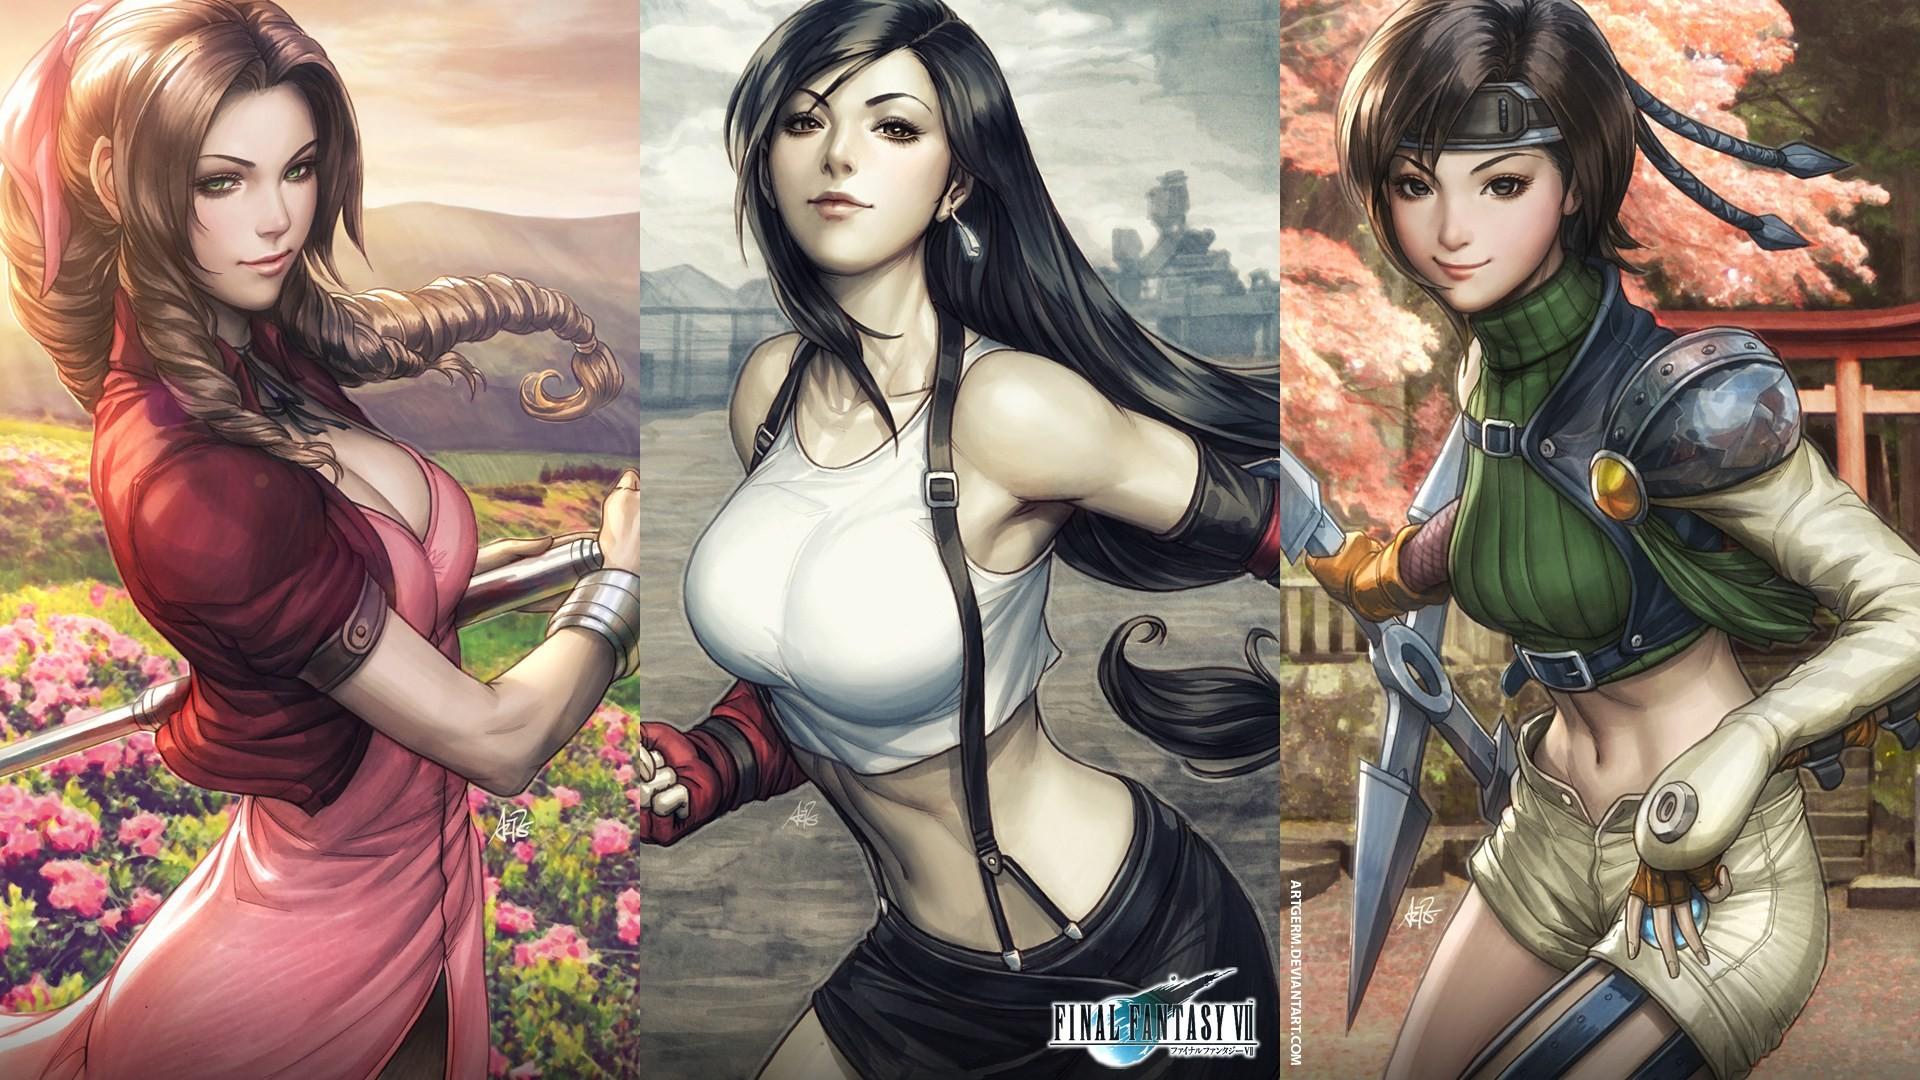 Res: 1920x1080, Widescreen resolutions Source · Aerith Gainsborough Art Artgerm Stanley Lau  Final Fantasy Tifa